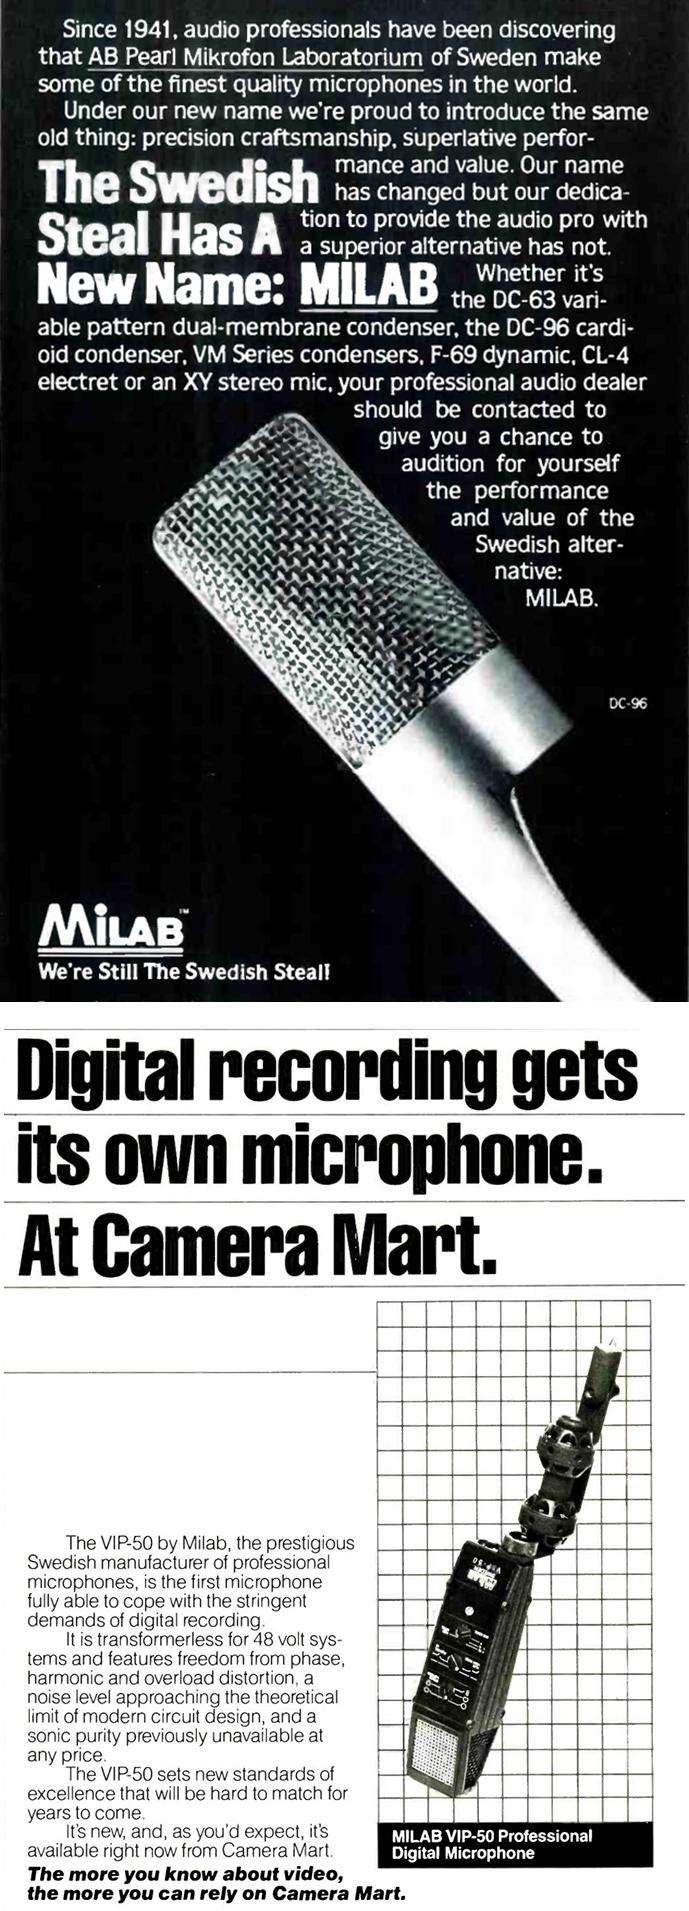 Milab ads 1980s